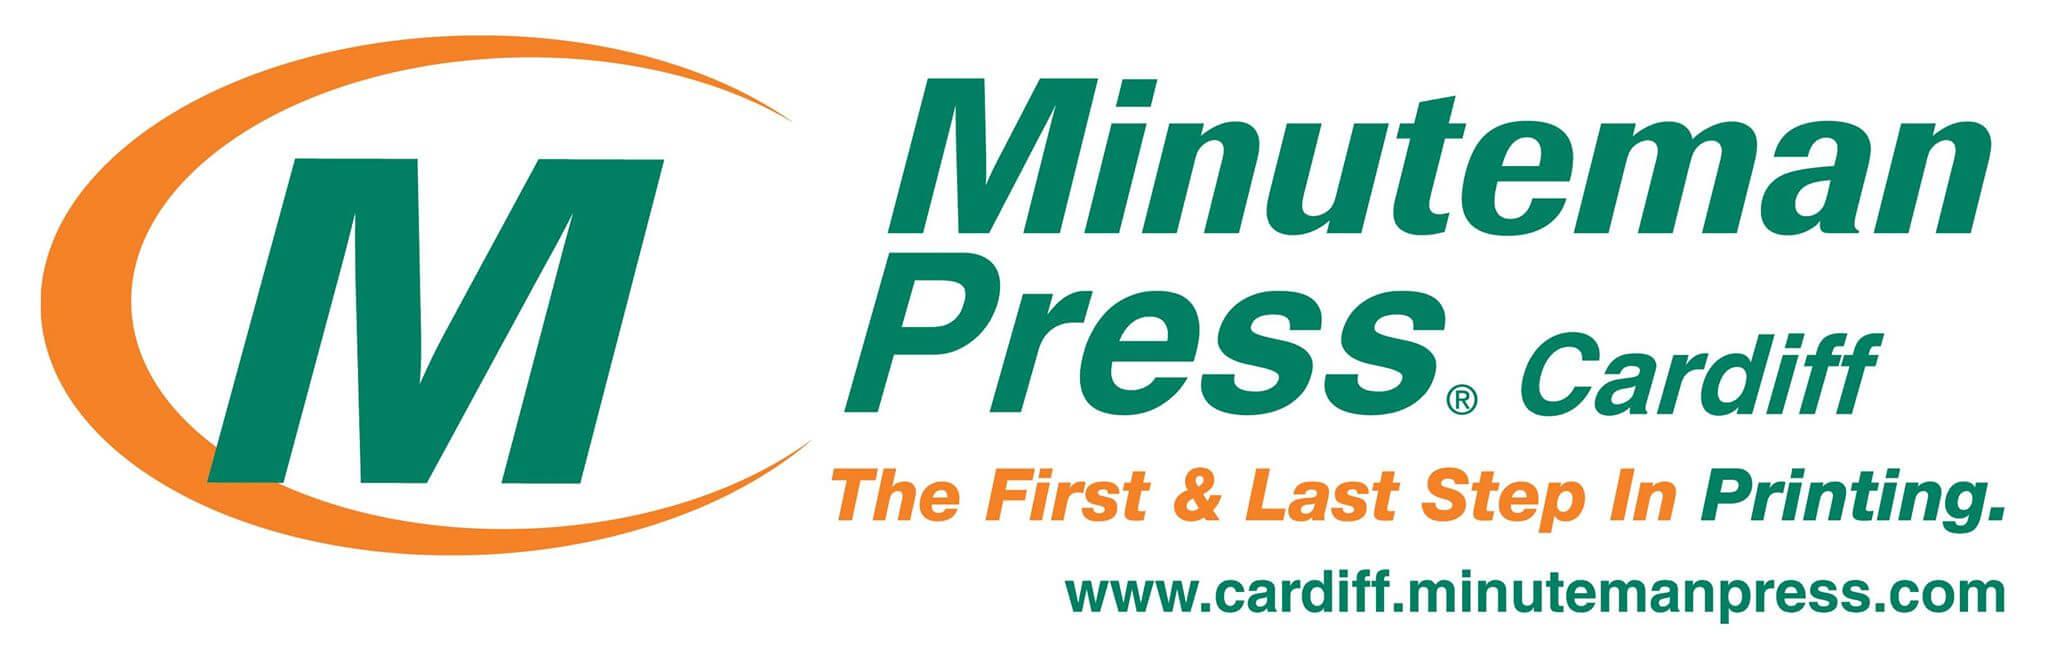 Minuteman sponsoring Caerphilly Cycling Club